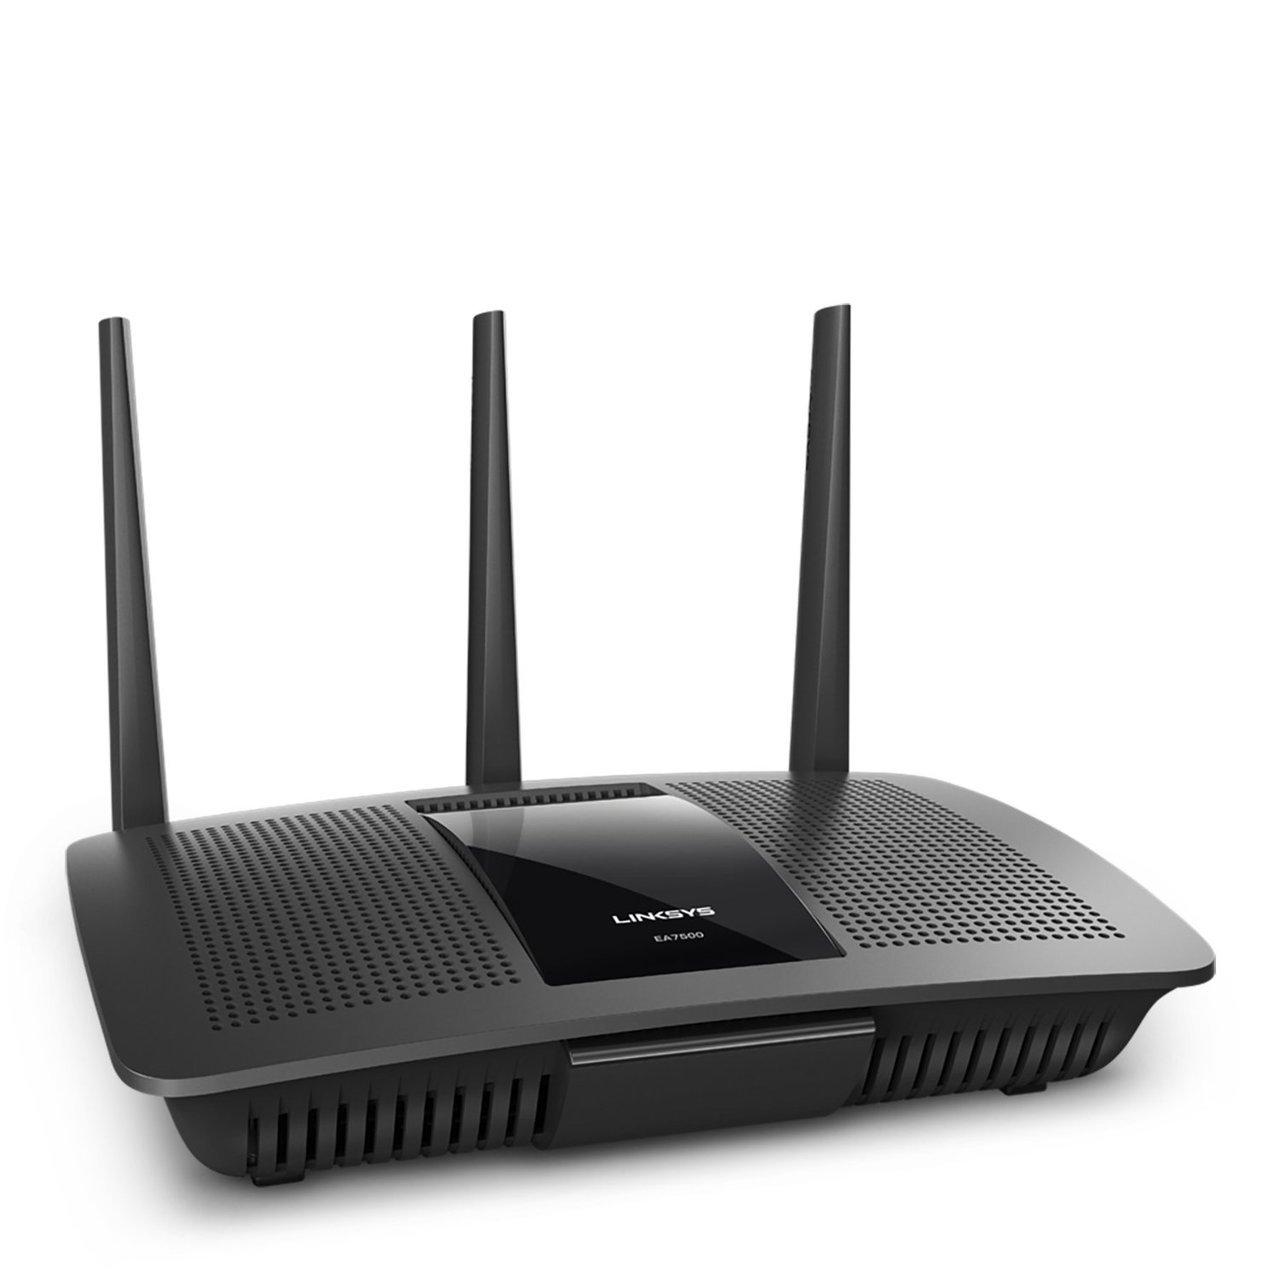 Linksys EA7500 Max-Stream™ AC1900  Gigabit Wi-Fi Router